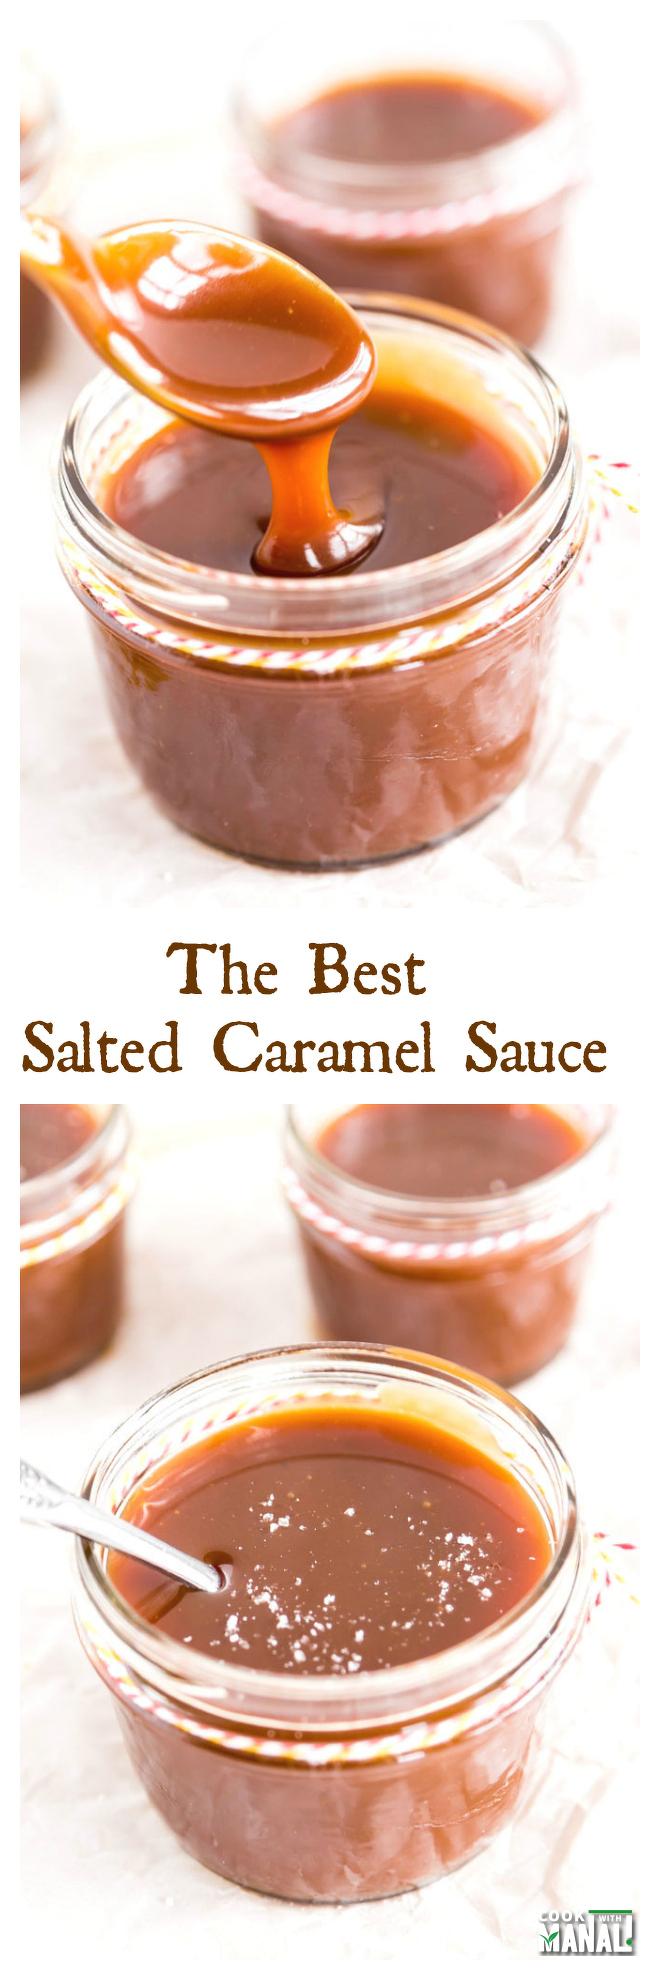 Best Salted Caramel Sauce Collage